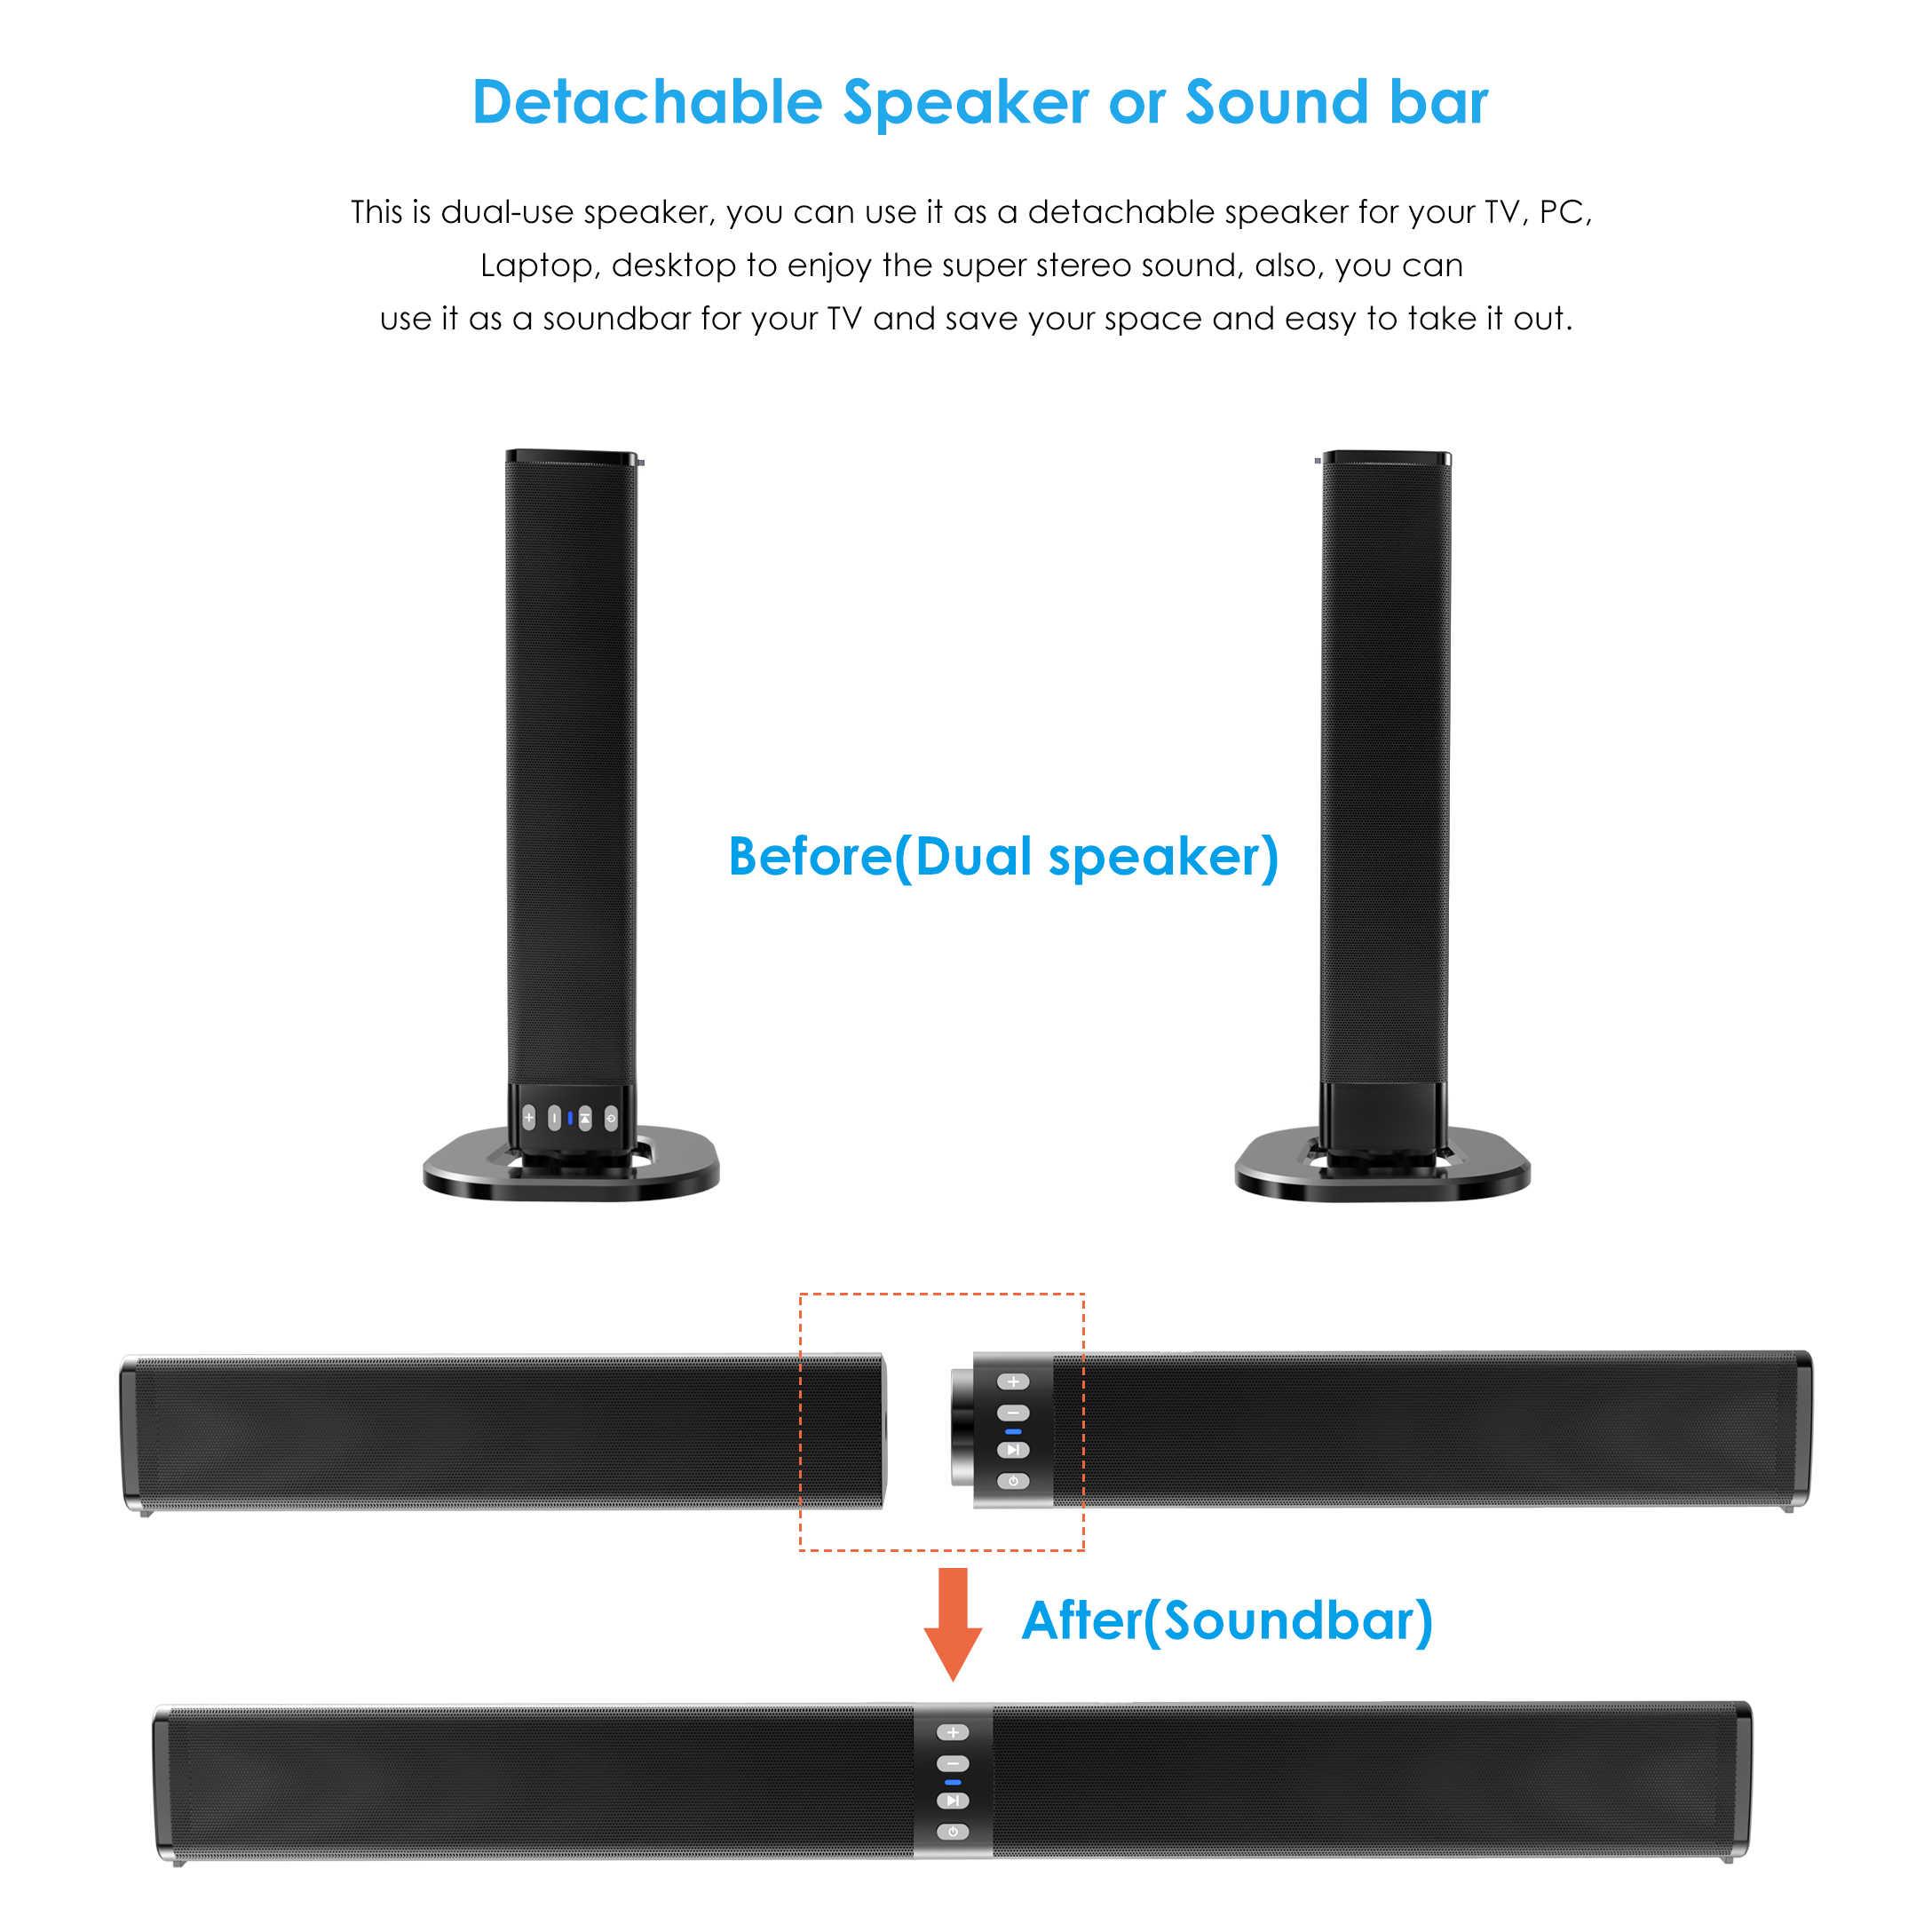 Centro musicale Separabile Soundbar 4.0 Canali 3D Surround Sound 20W Speaker Bluetooth con IL MIC Built-in Casa Subwoofer teatro